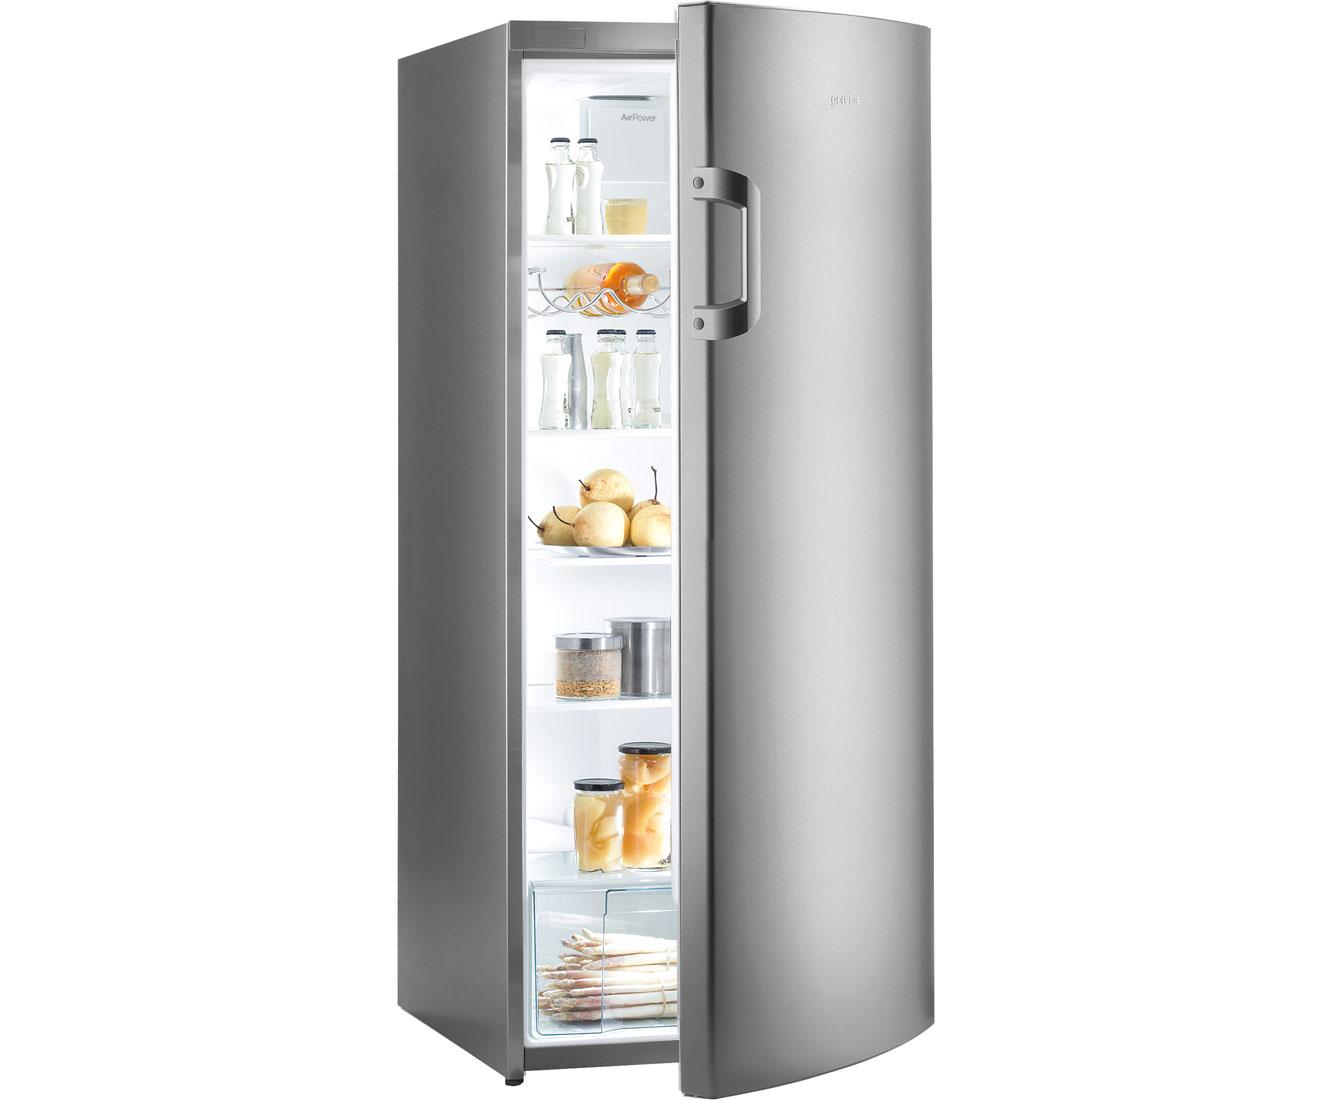 Kühlschrank Schloss : Kühlschrank mit schloss ferienwohnung peters hamburg neuengamme